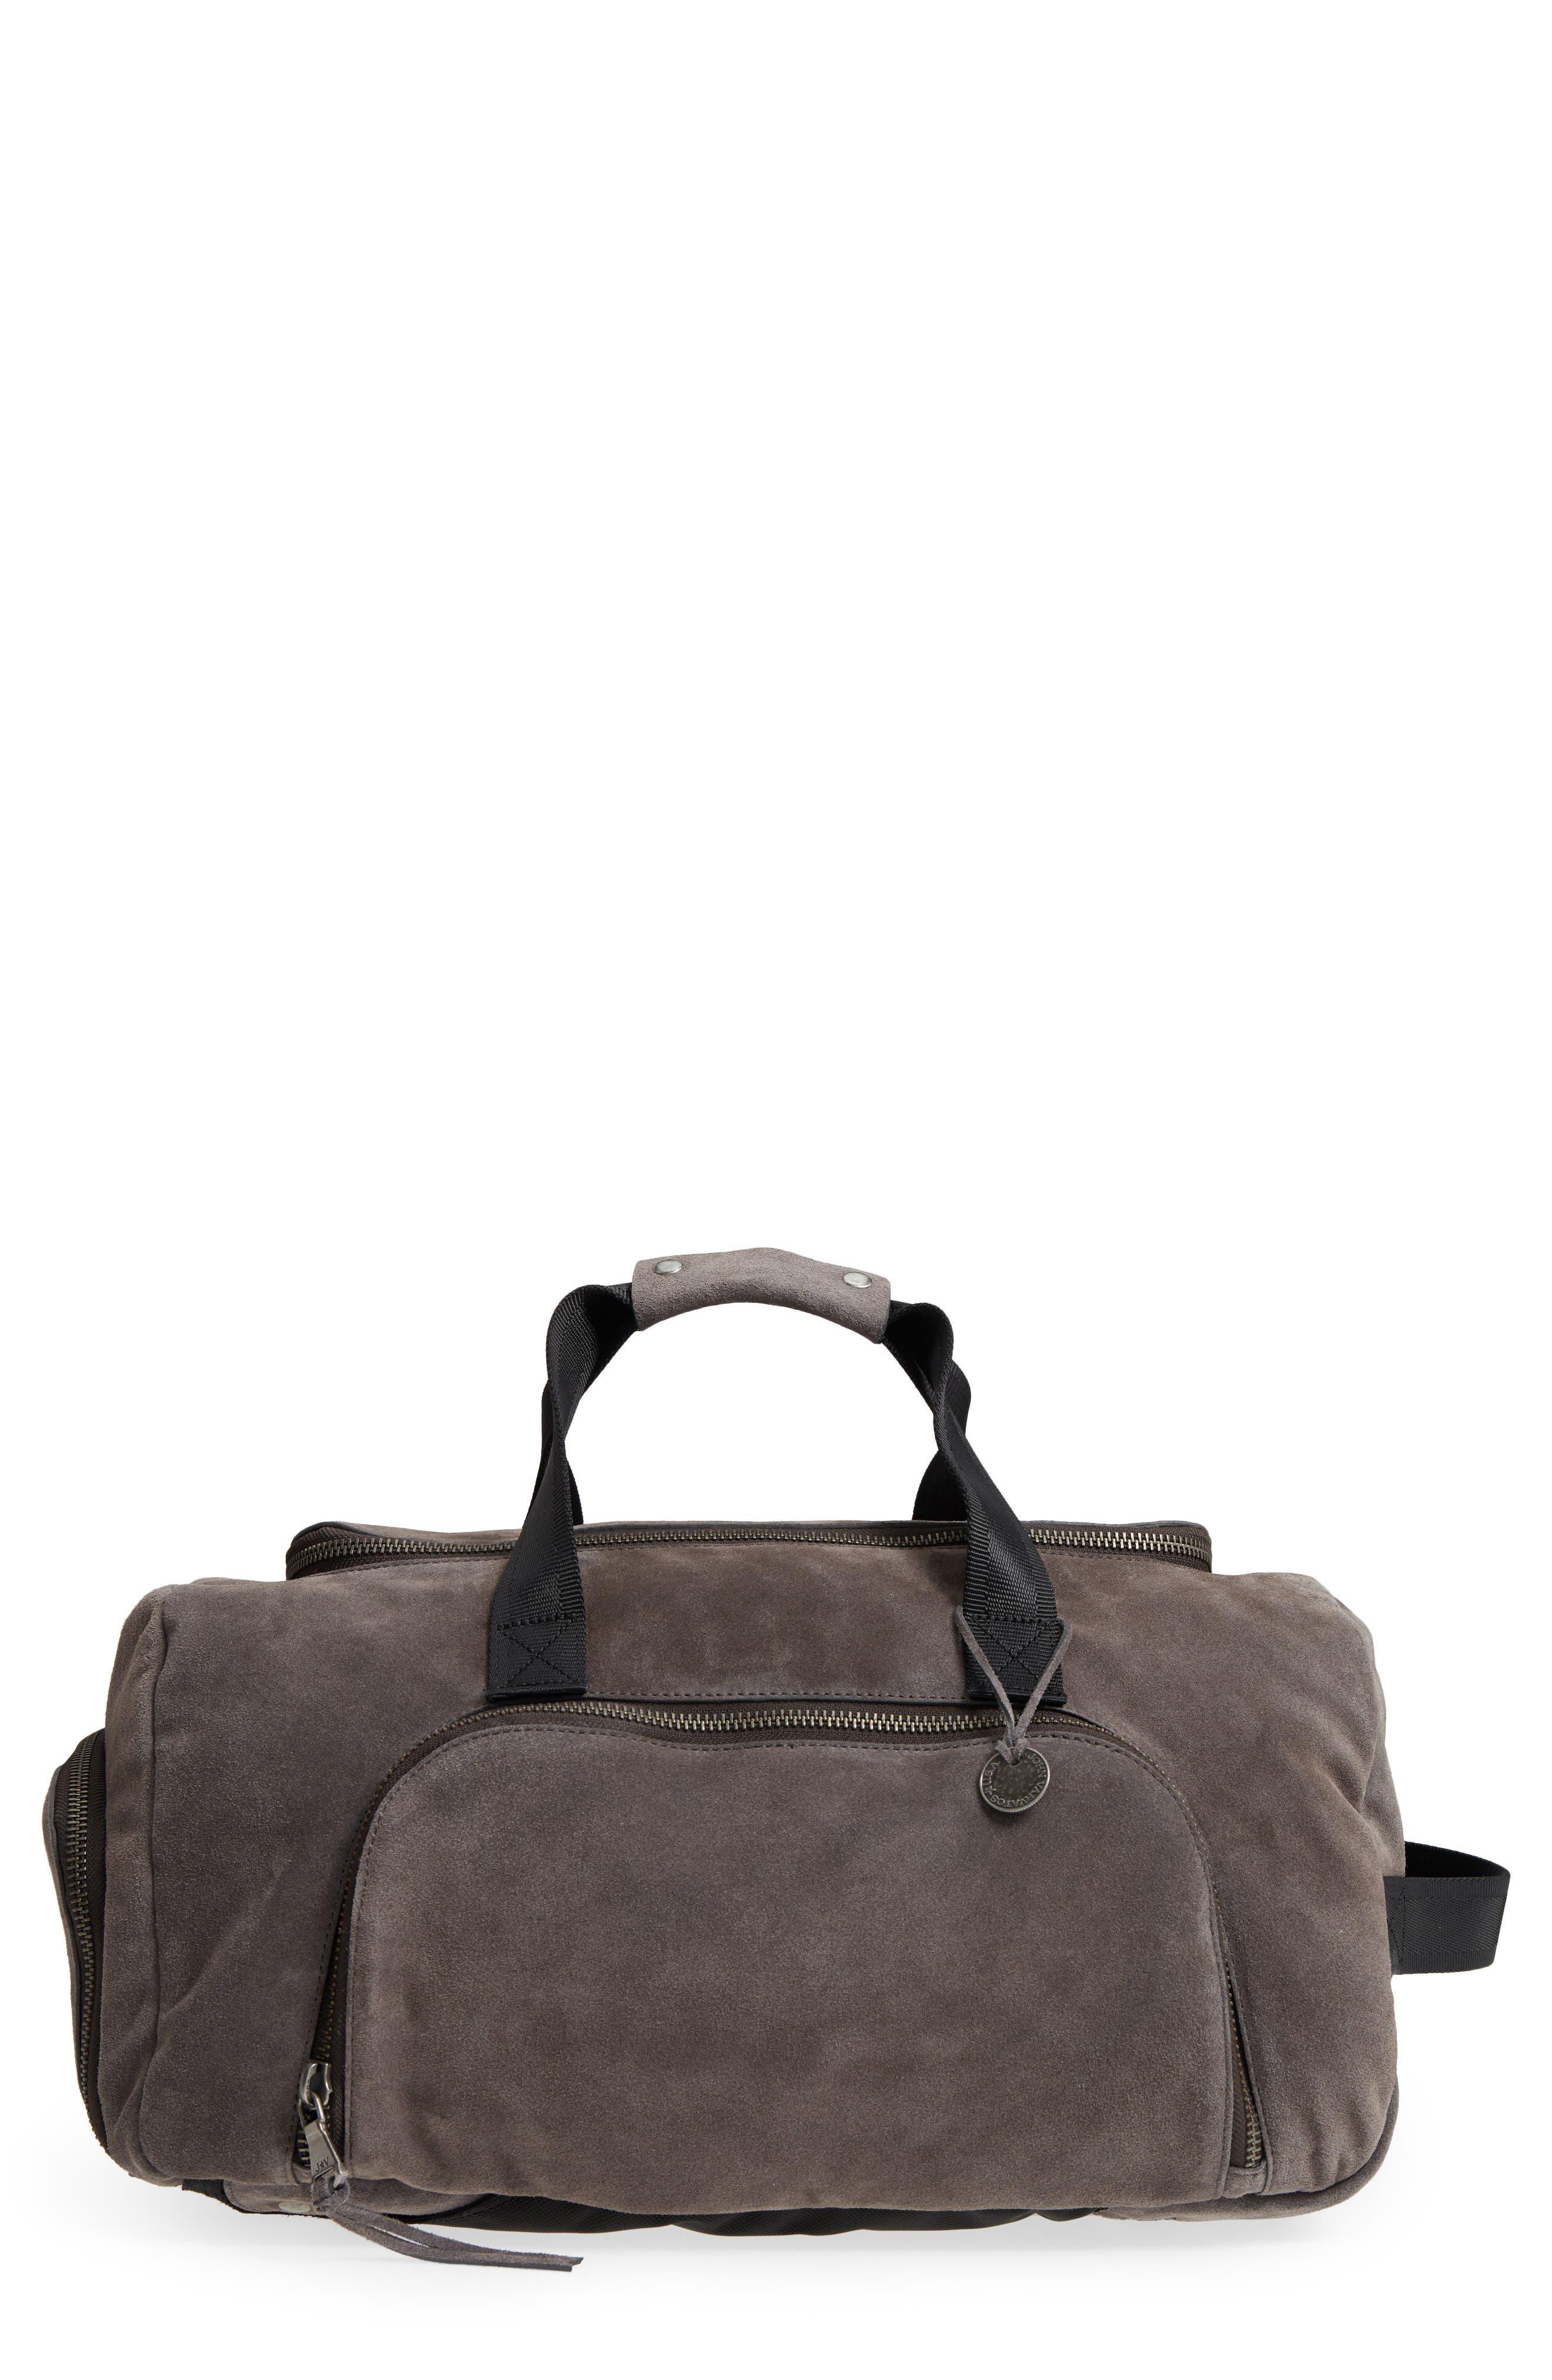 Brooklyn Suede Convertible Duffel Bag,                         Main,                         color,